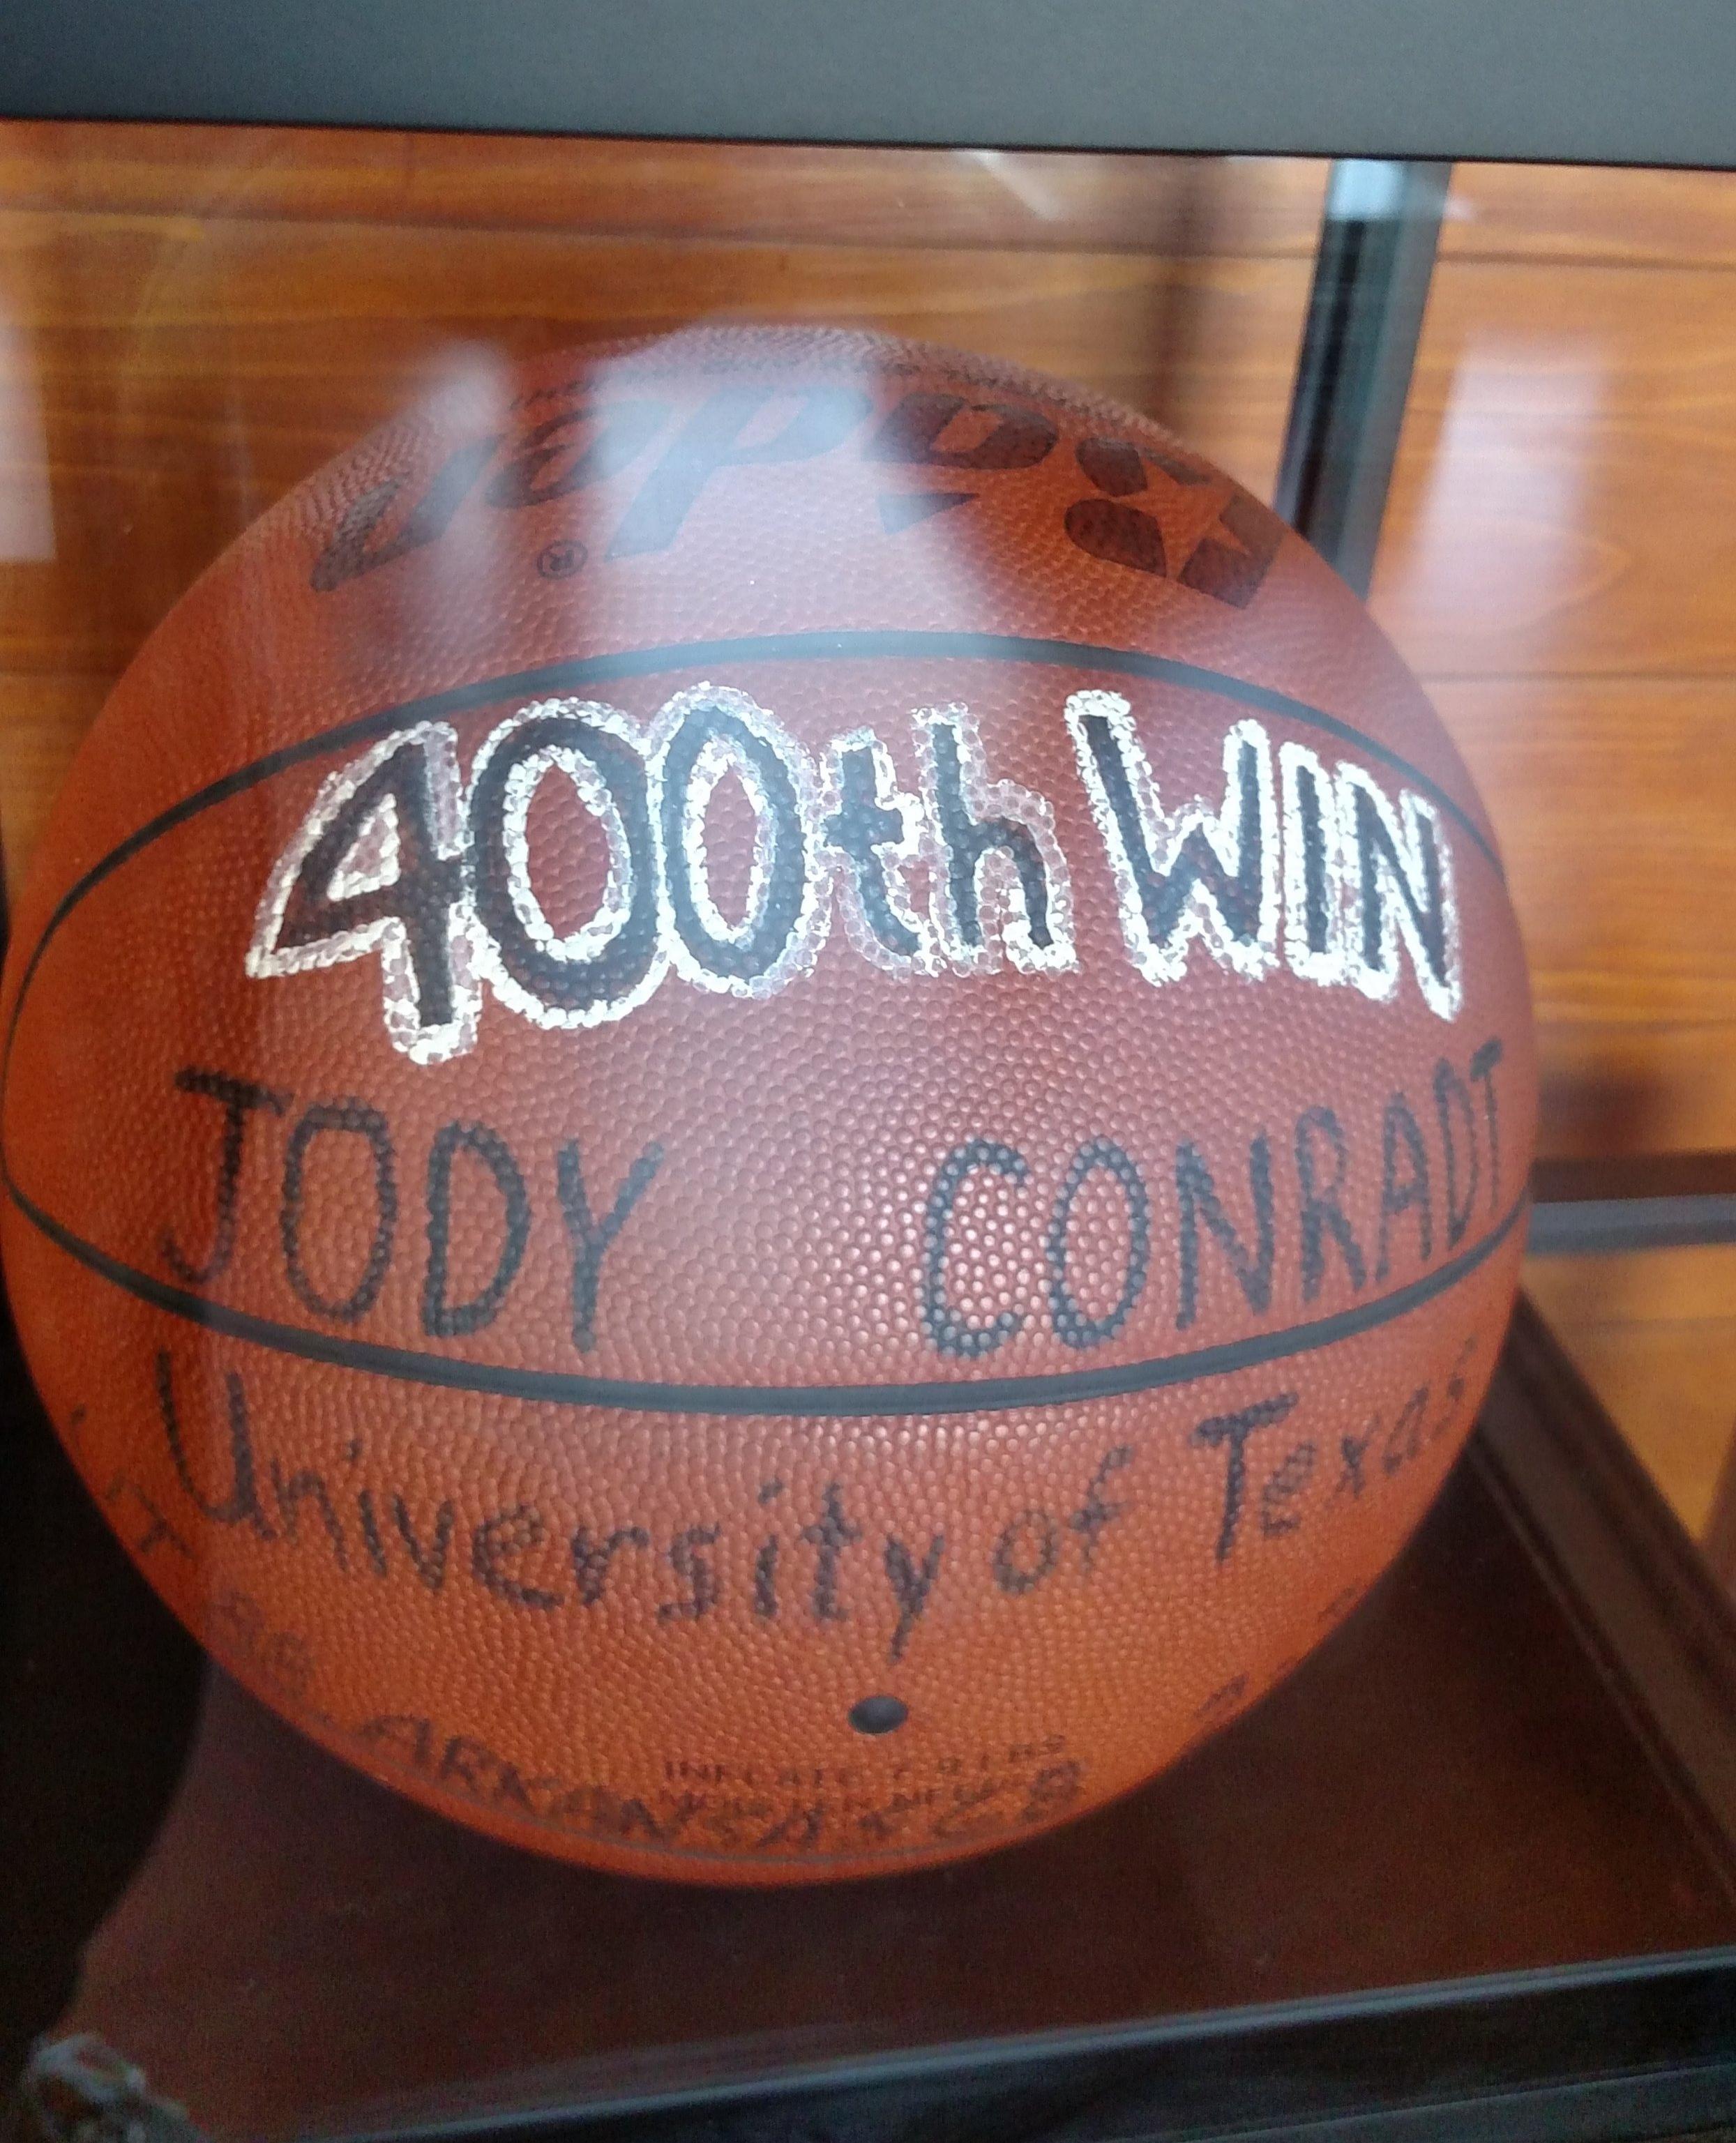 400 wins